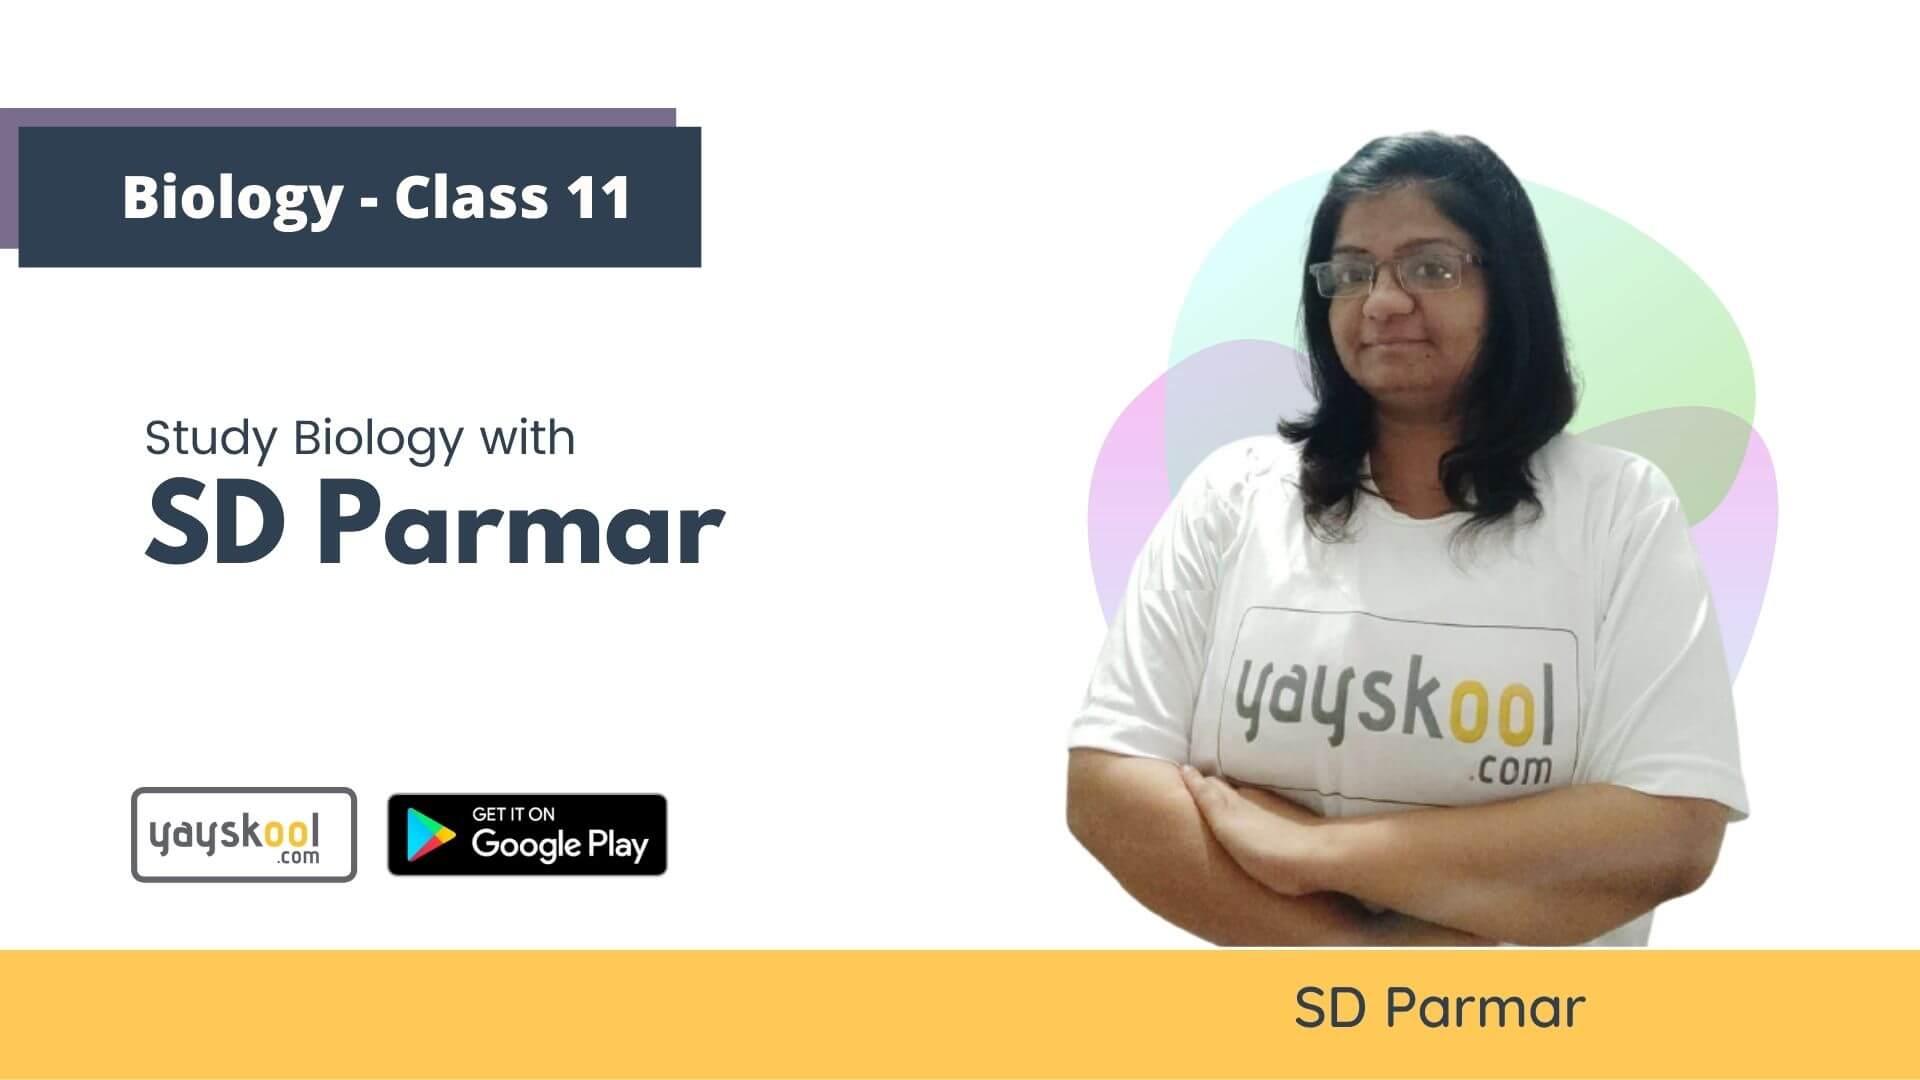 biology-course-class11-sd-parmar